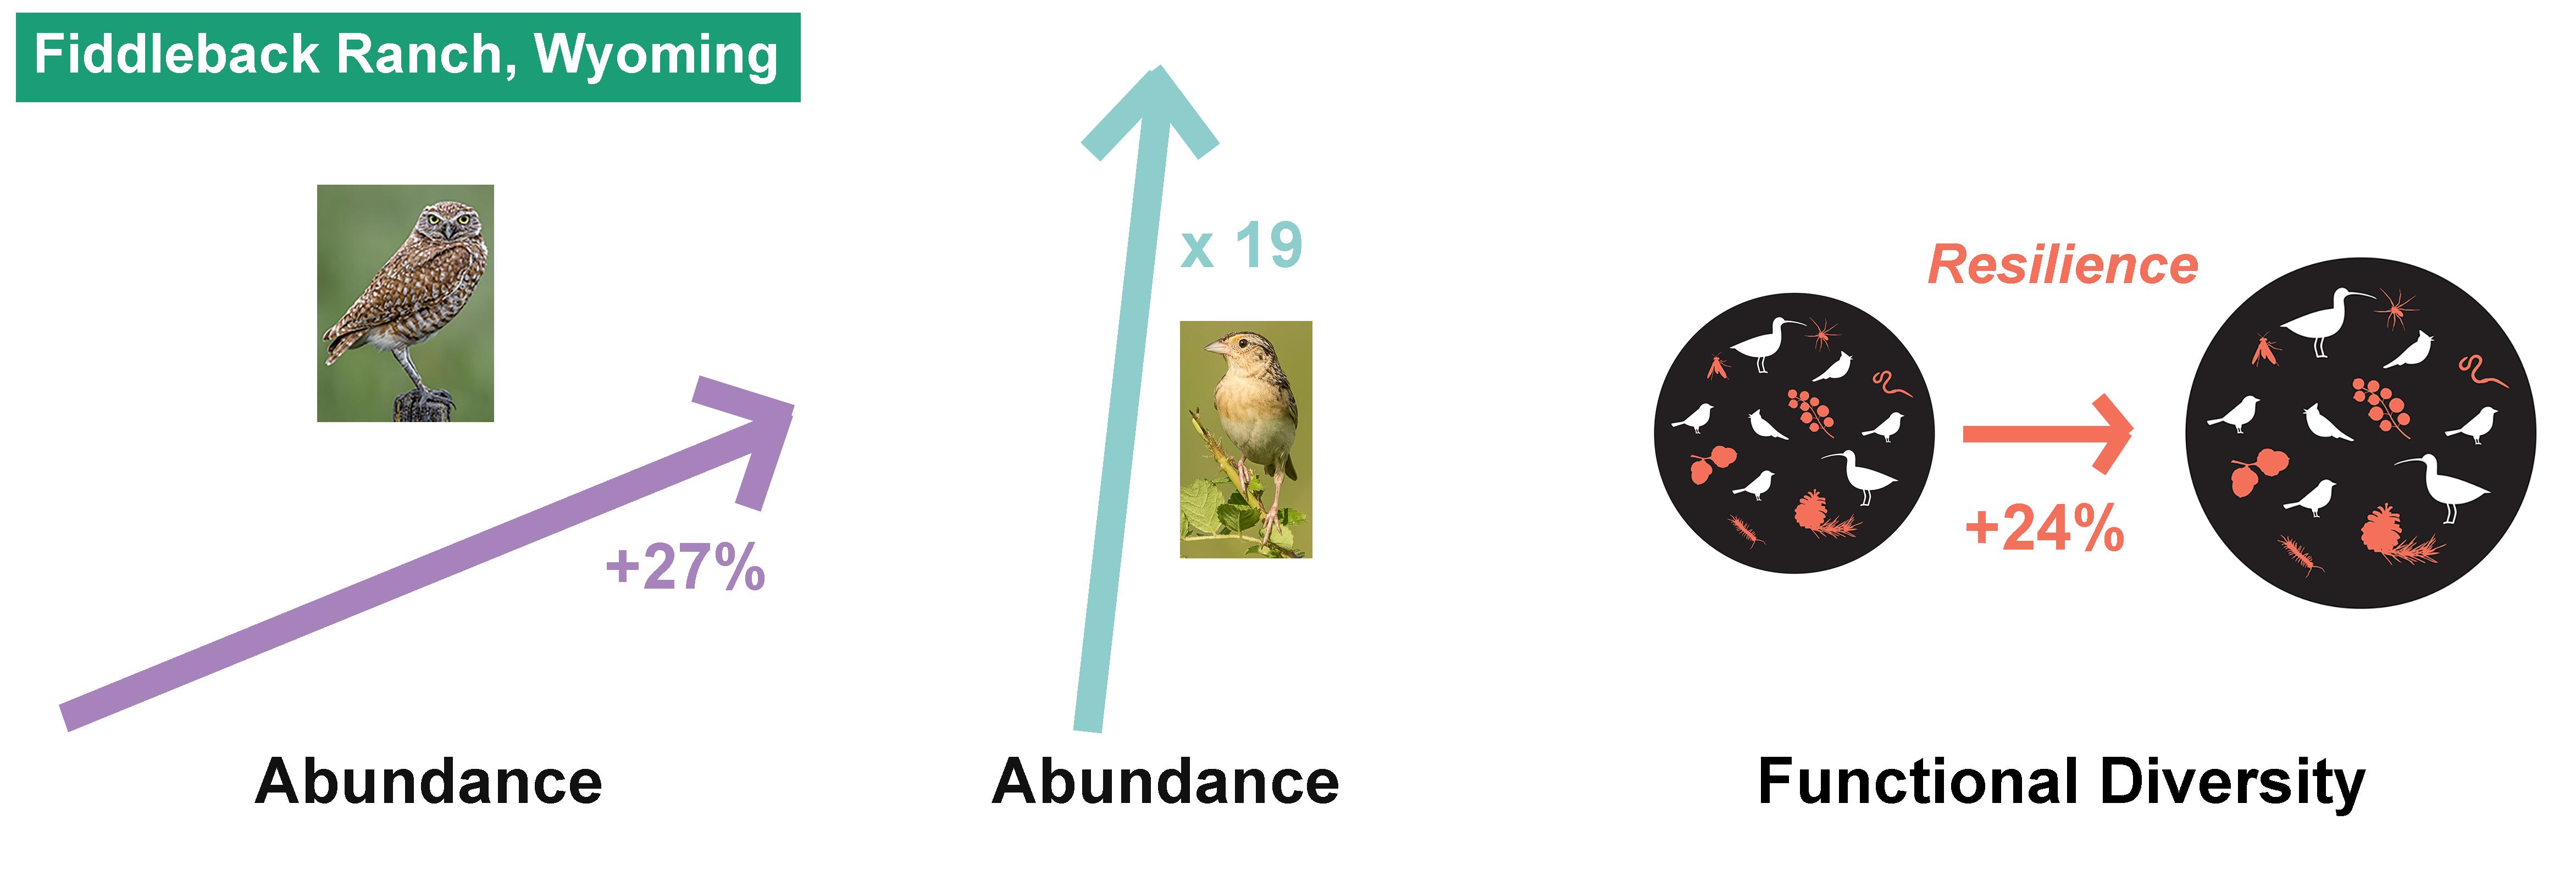 Photos from left: Burrowing Owl, Brad Lewis/Audubon Photography Awards; Grasshopper Sparrow, Susan Ward/Audubon Photography Awards